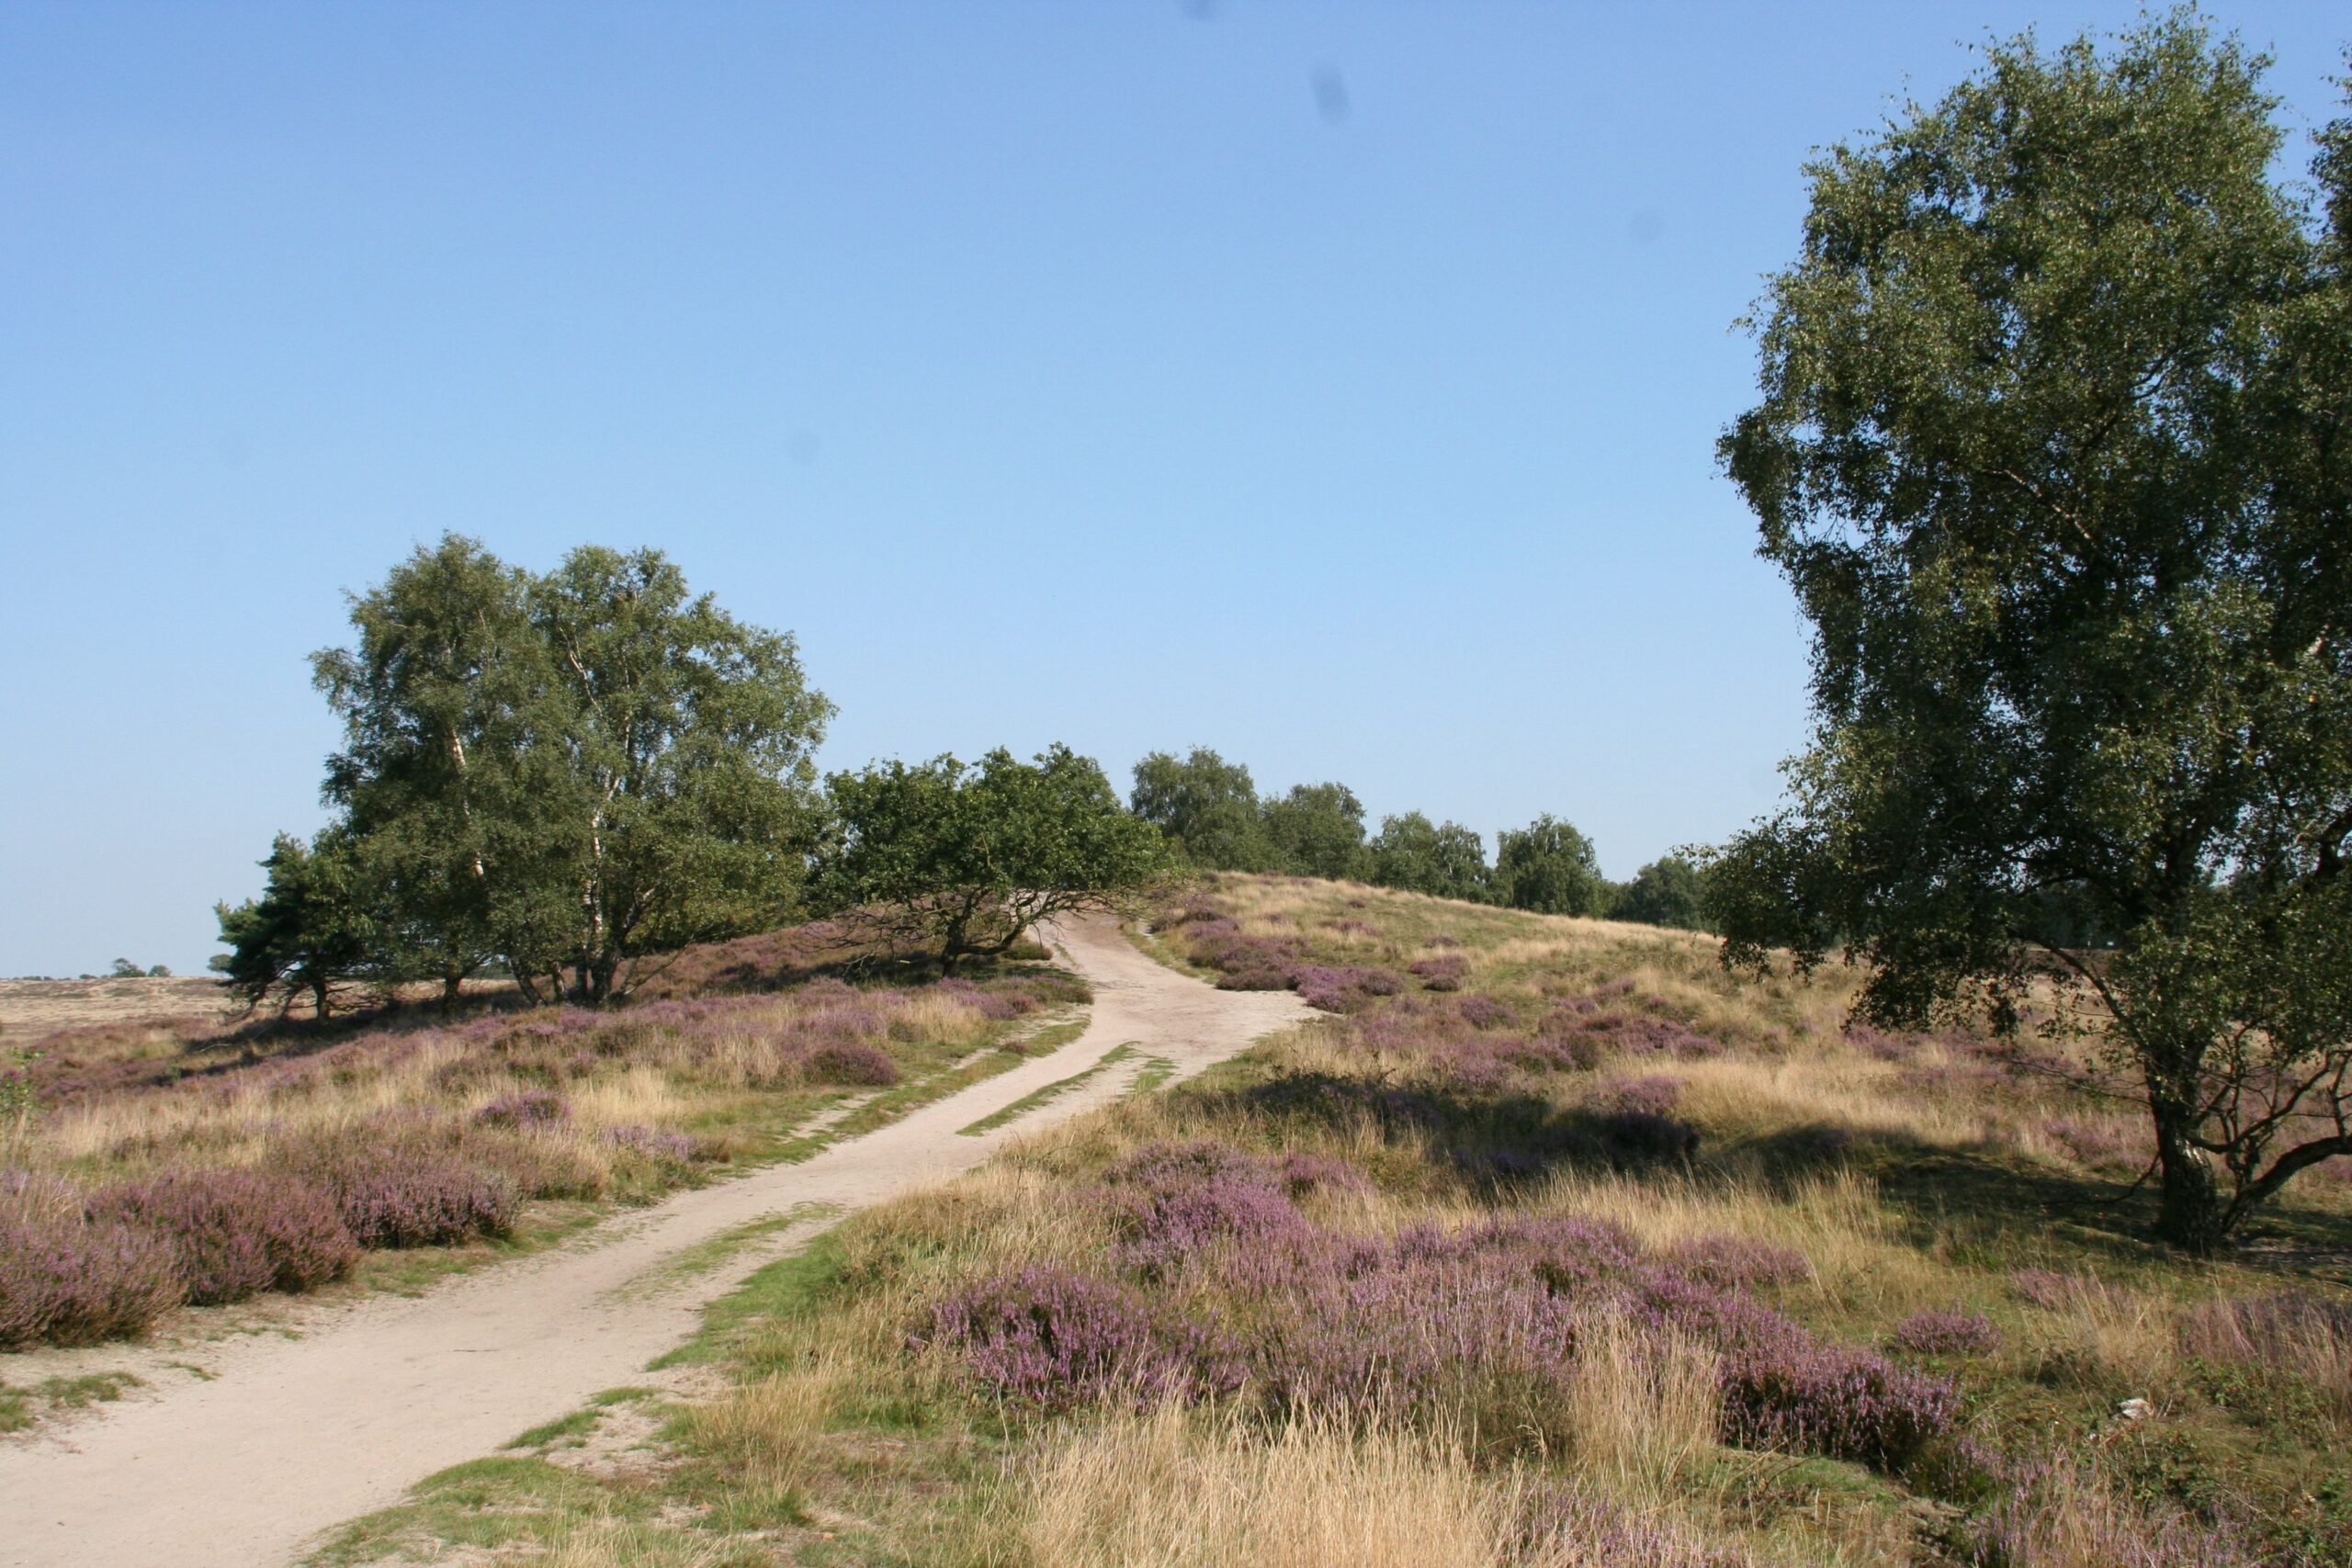 Nationaal Park De Maasduinen - De Hamert